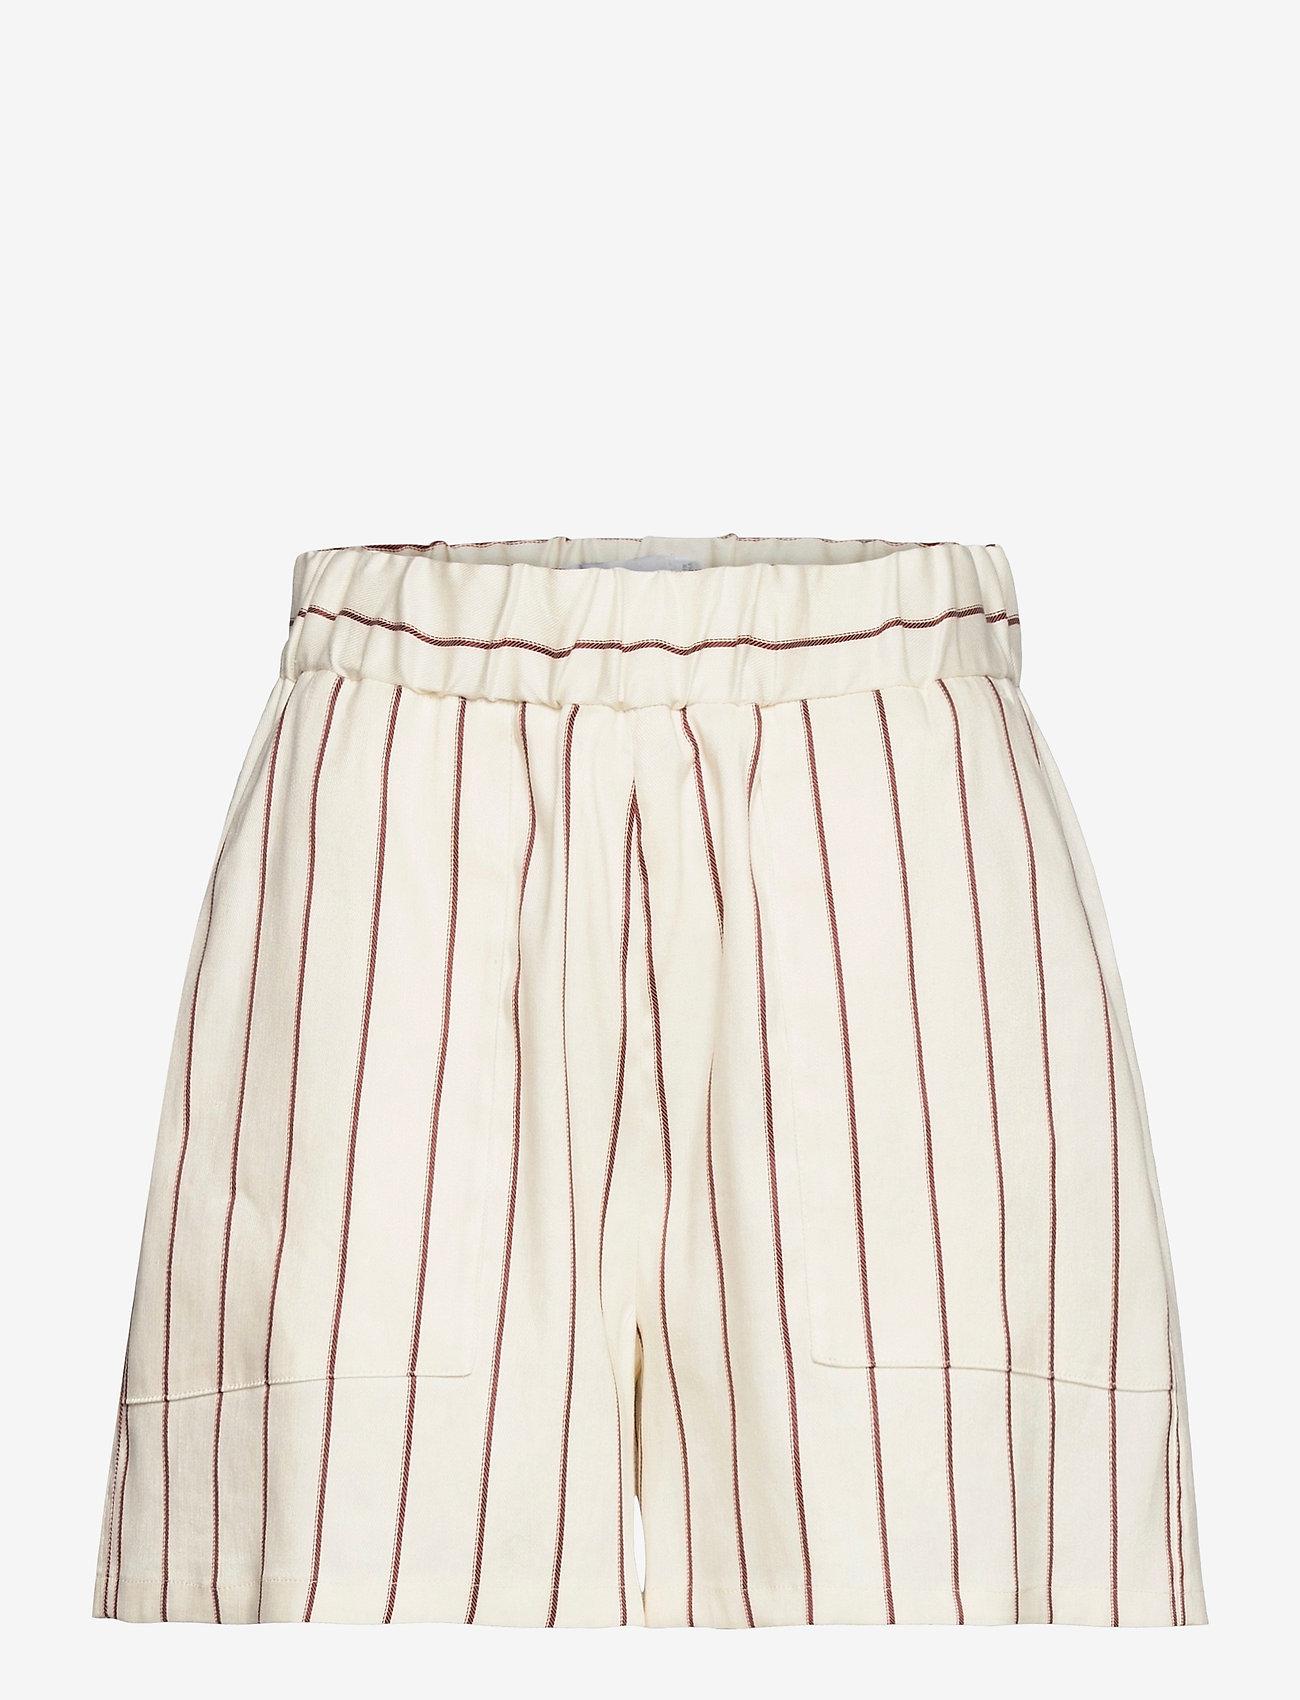 Closed - womens shorts - shorts casual - red sun - 0